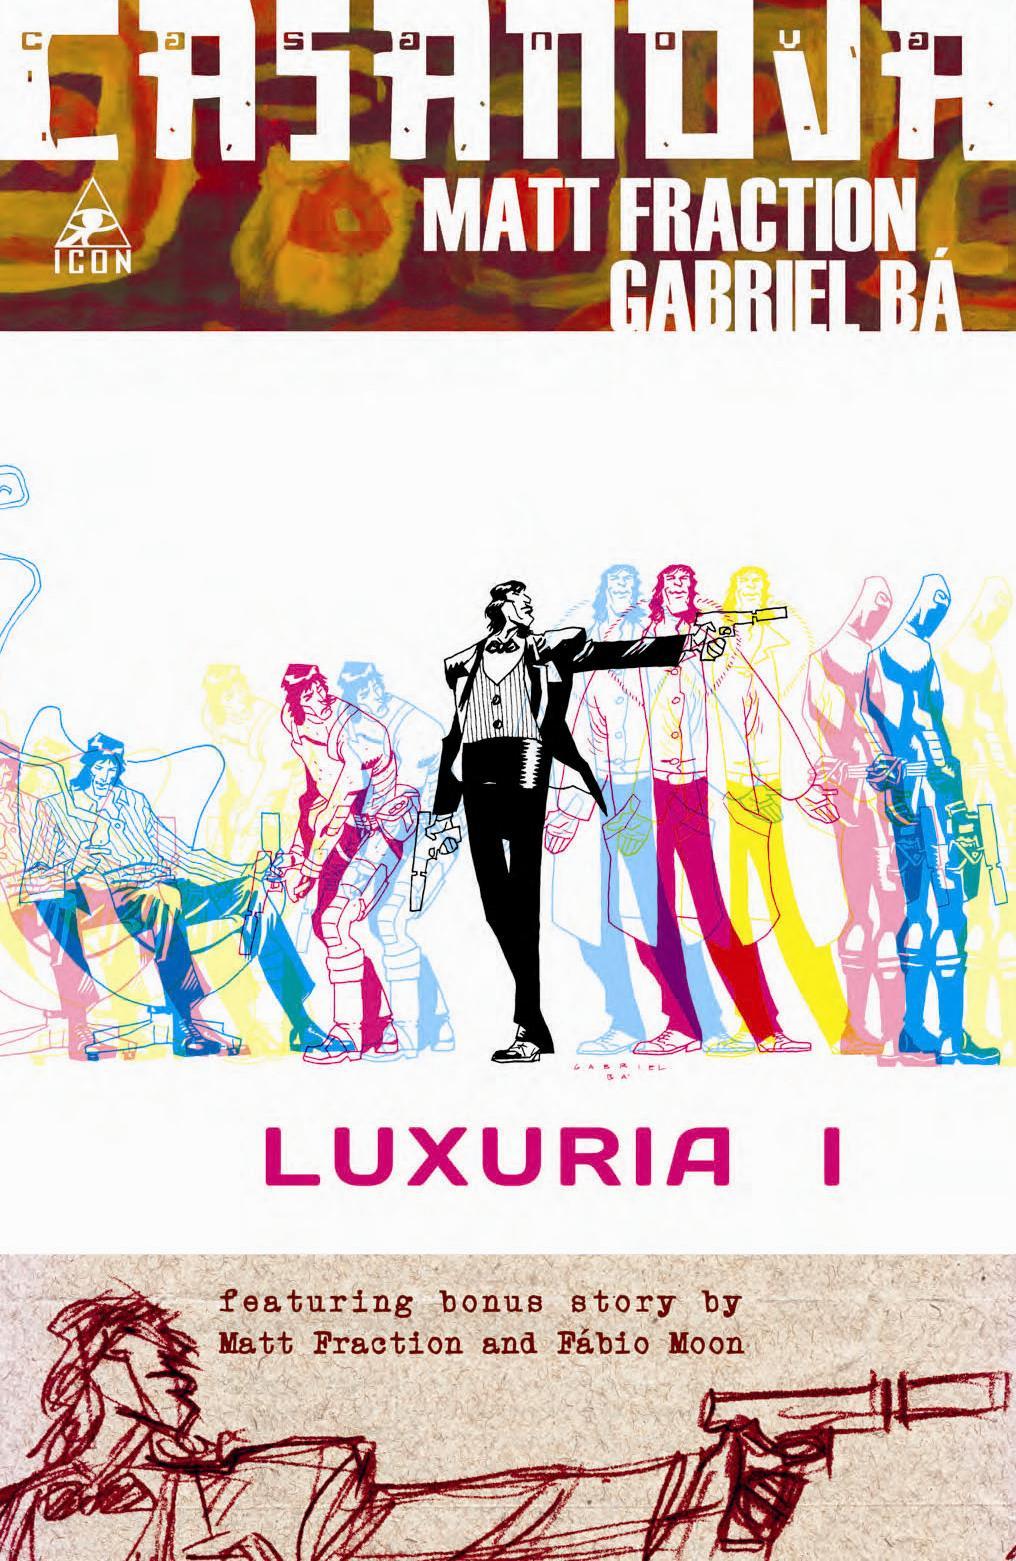 CASANOVA_1_2nd CASANOVA: The Most Mind-Blowing Book Of The Century